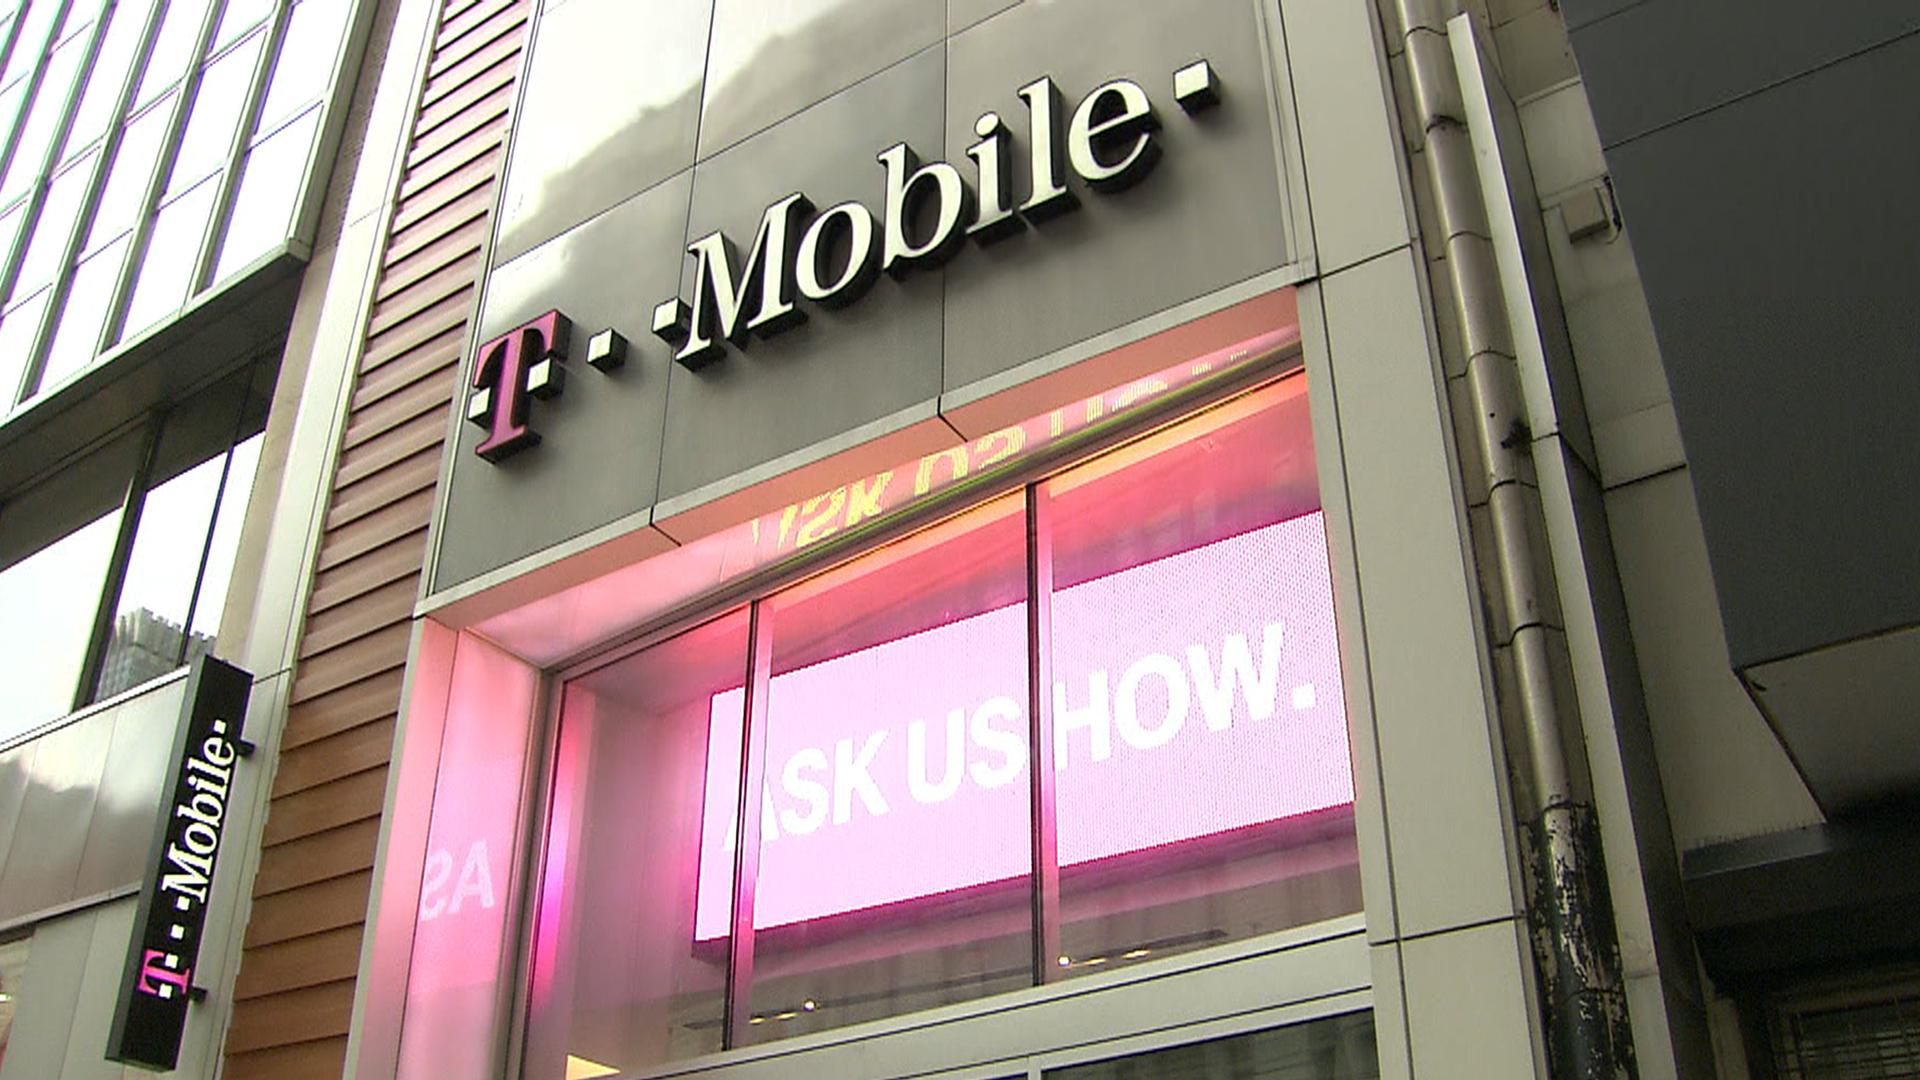 T-Mobile customers' stolen taken after Experian hack